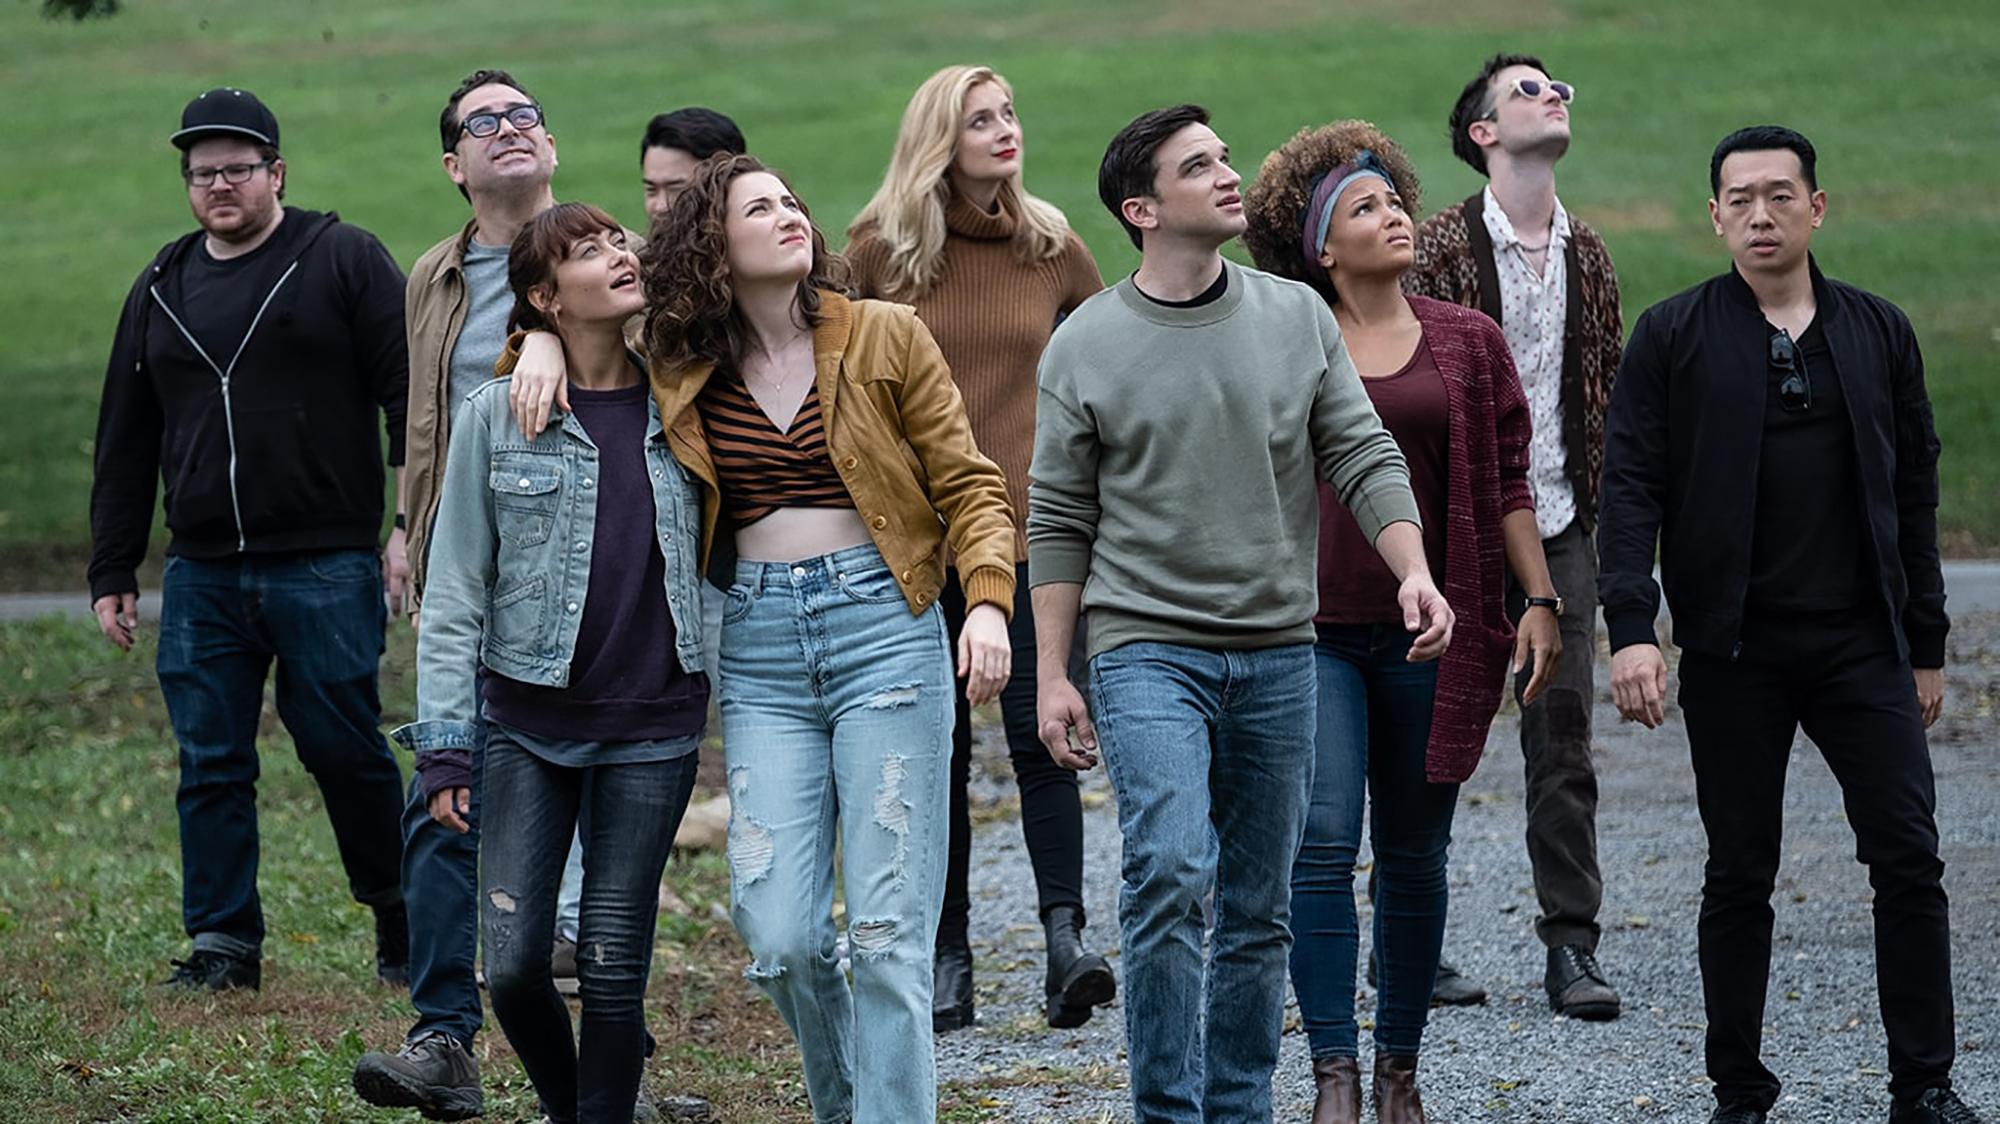 Starz Restaurant Drama 'Sweetbitter' Is an All-Around Better Show in Season 2